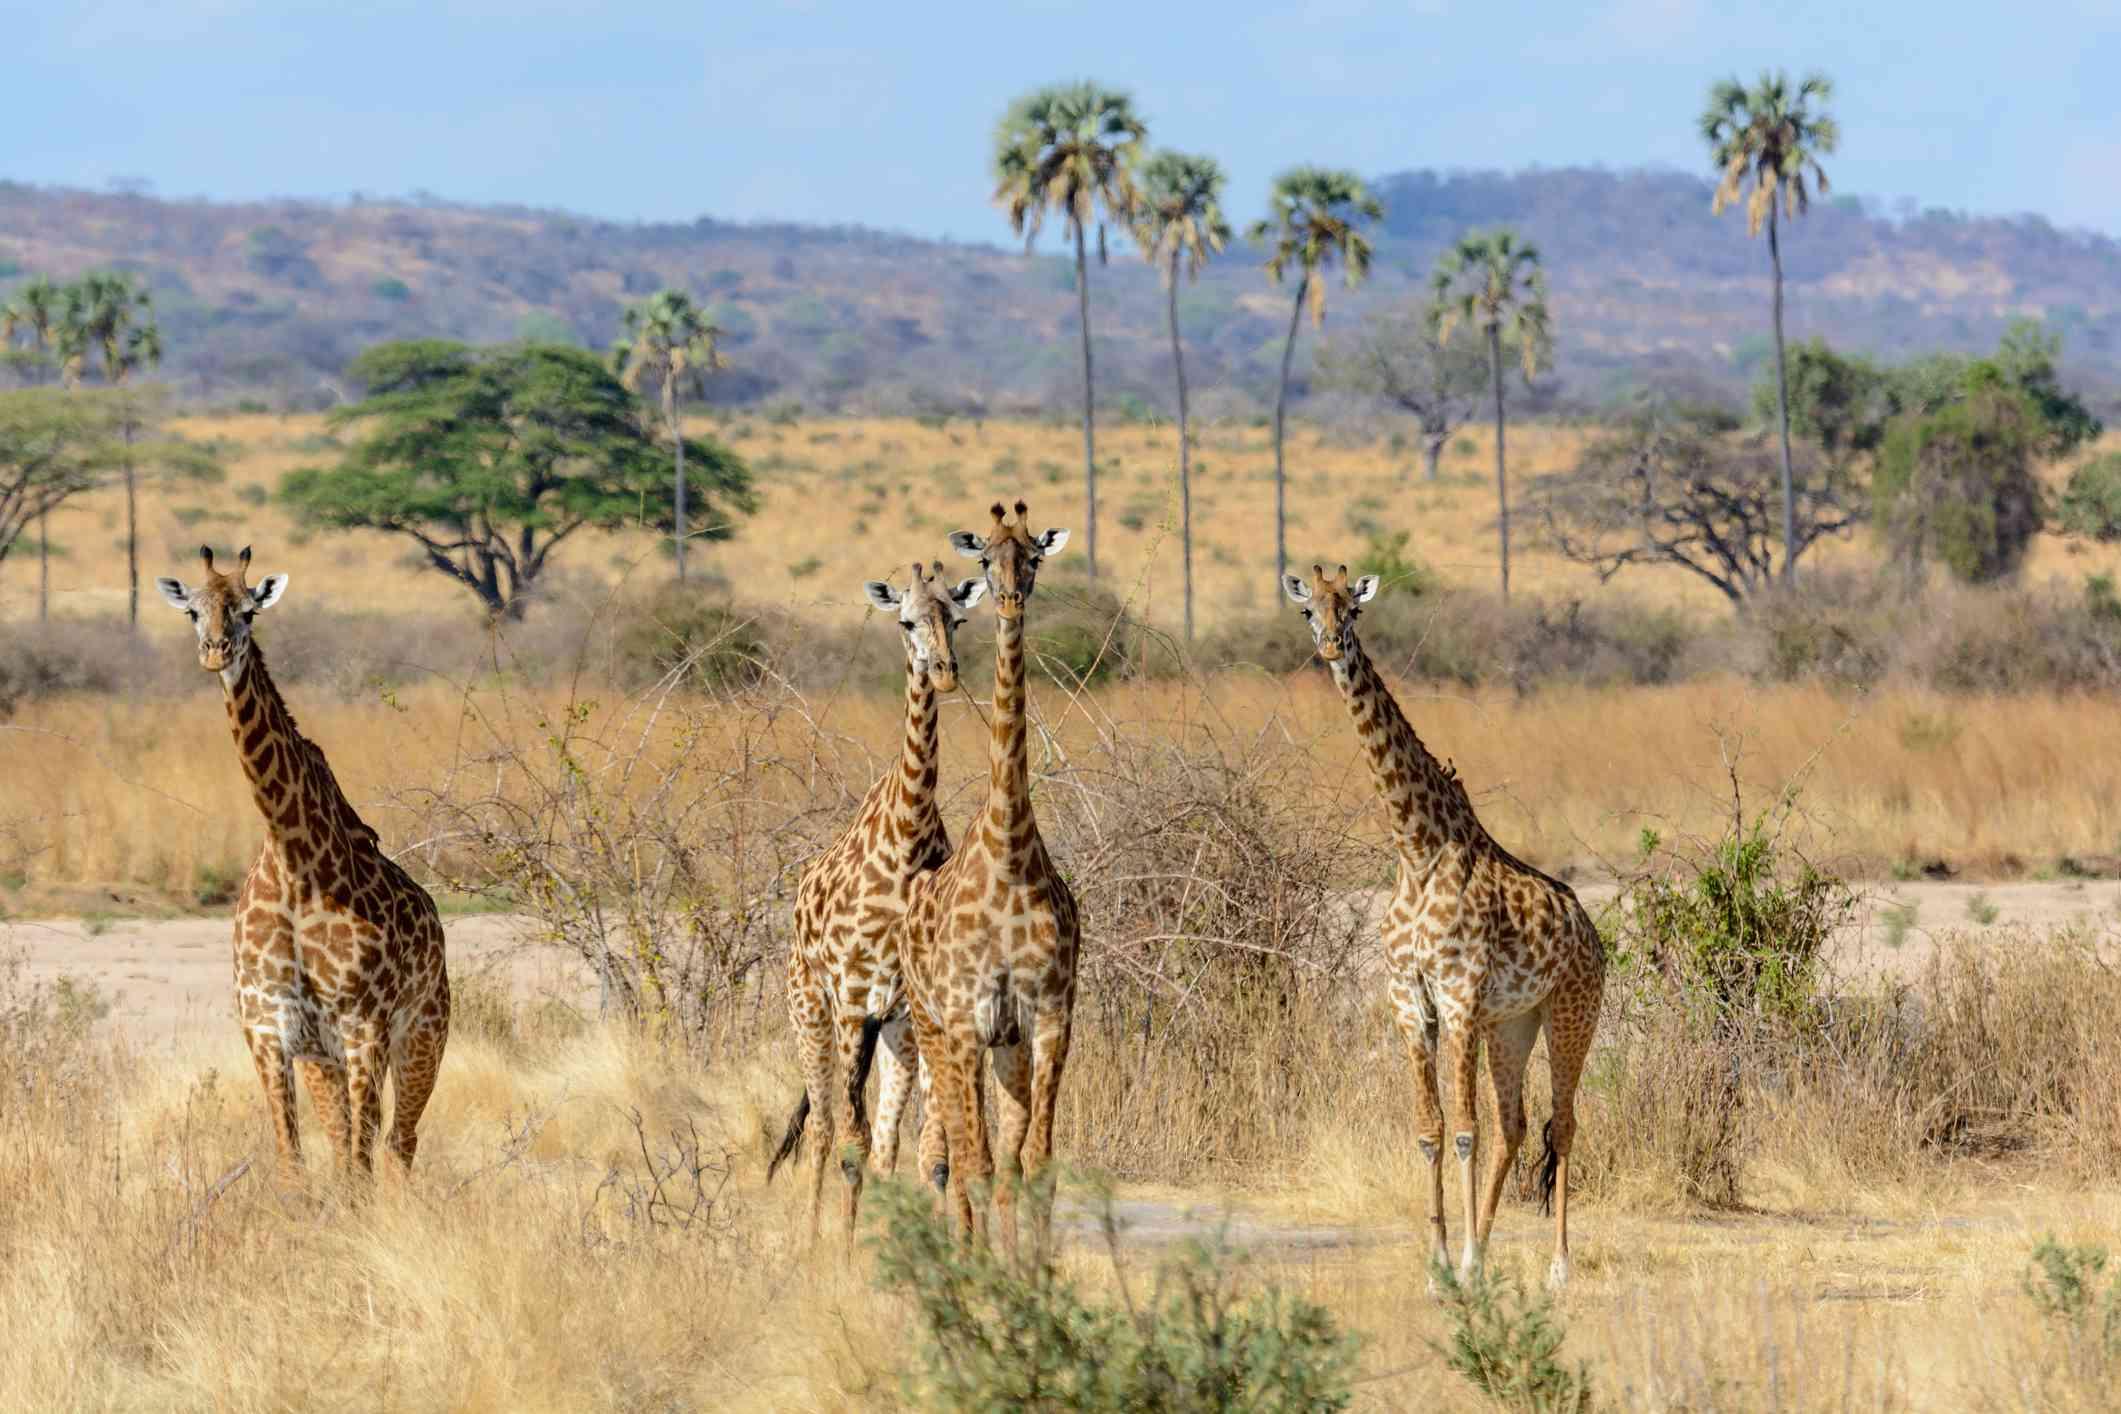 Four Maasai giraffes or Kilimanjaro giraffes walking in Ruaha National Park, Tanzania